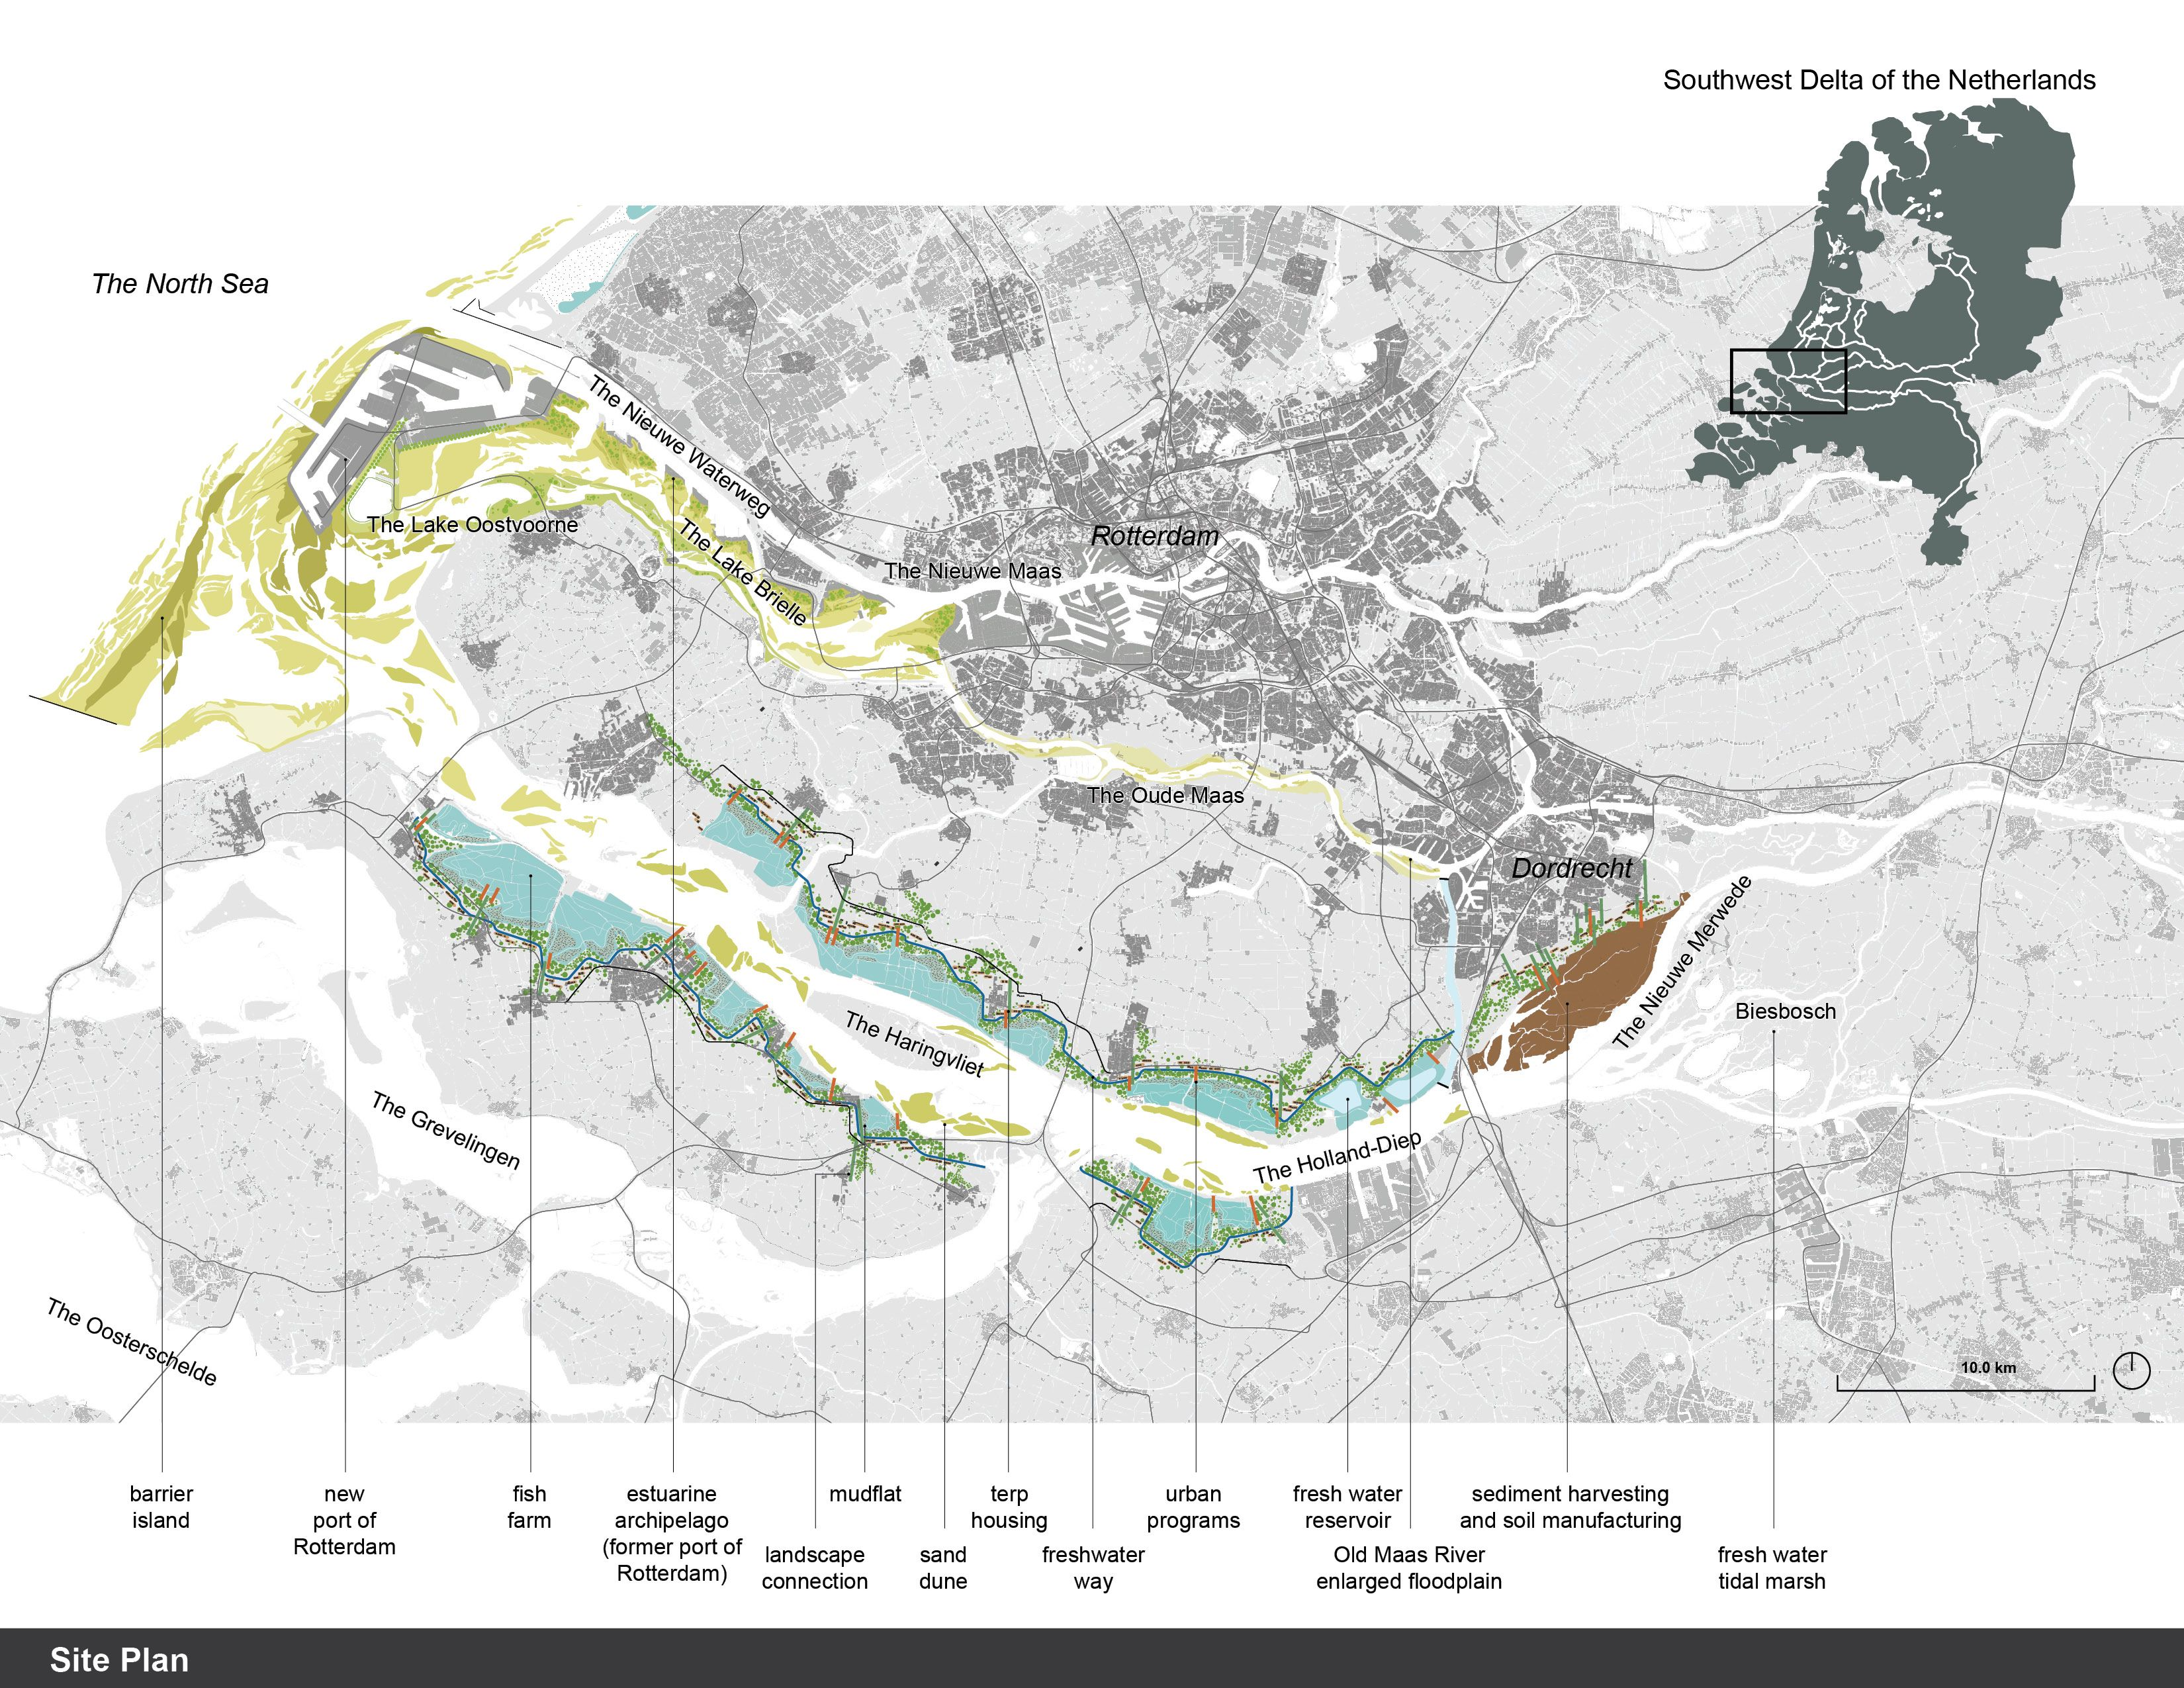 http://www.asla.org/2010studentawards/images/largescale/140_01.jpg